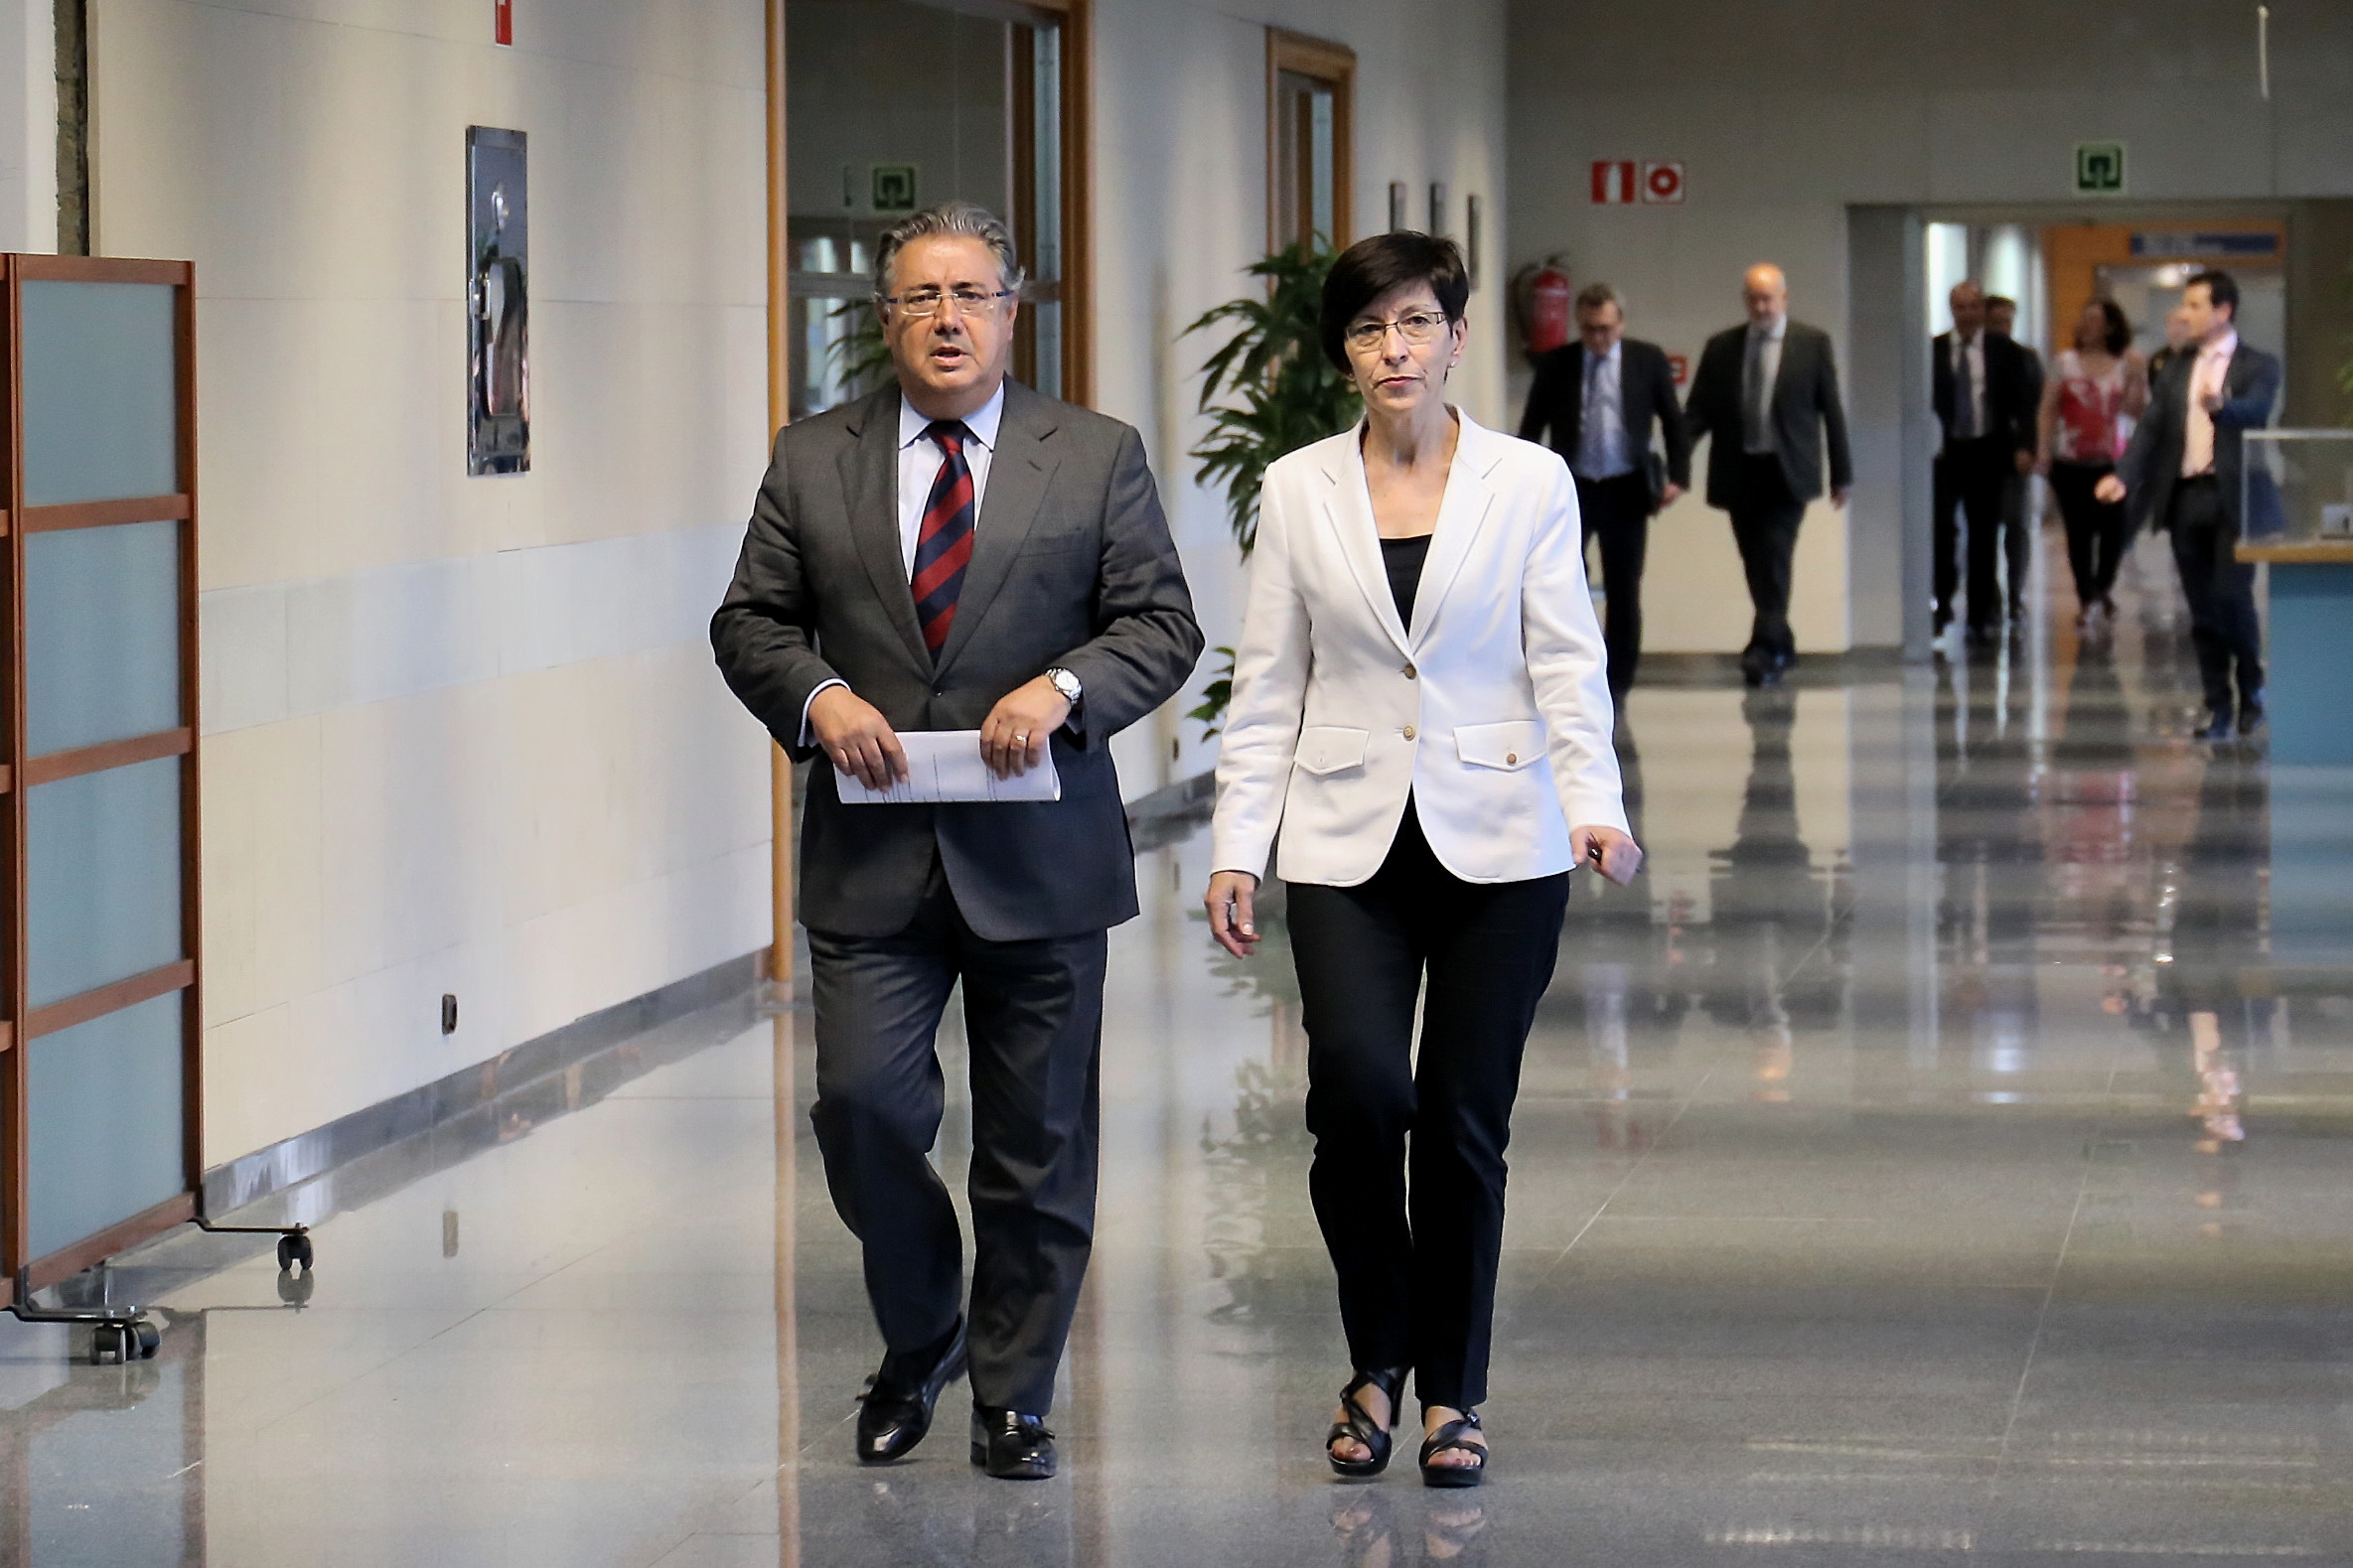 Irekia eusko jaurlaritza gobierno vasco ministerio for Director de seguridad ministerio del interior